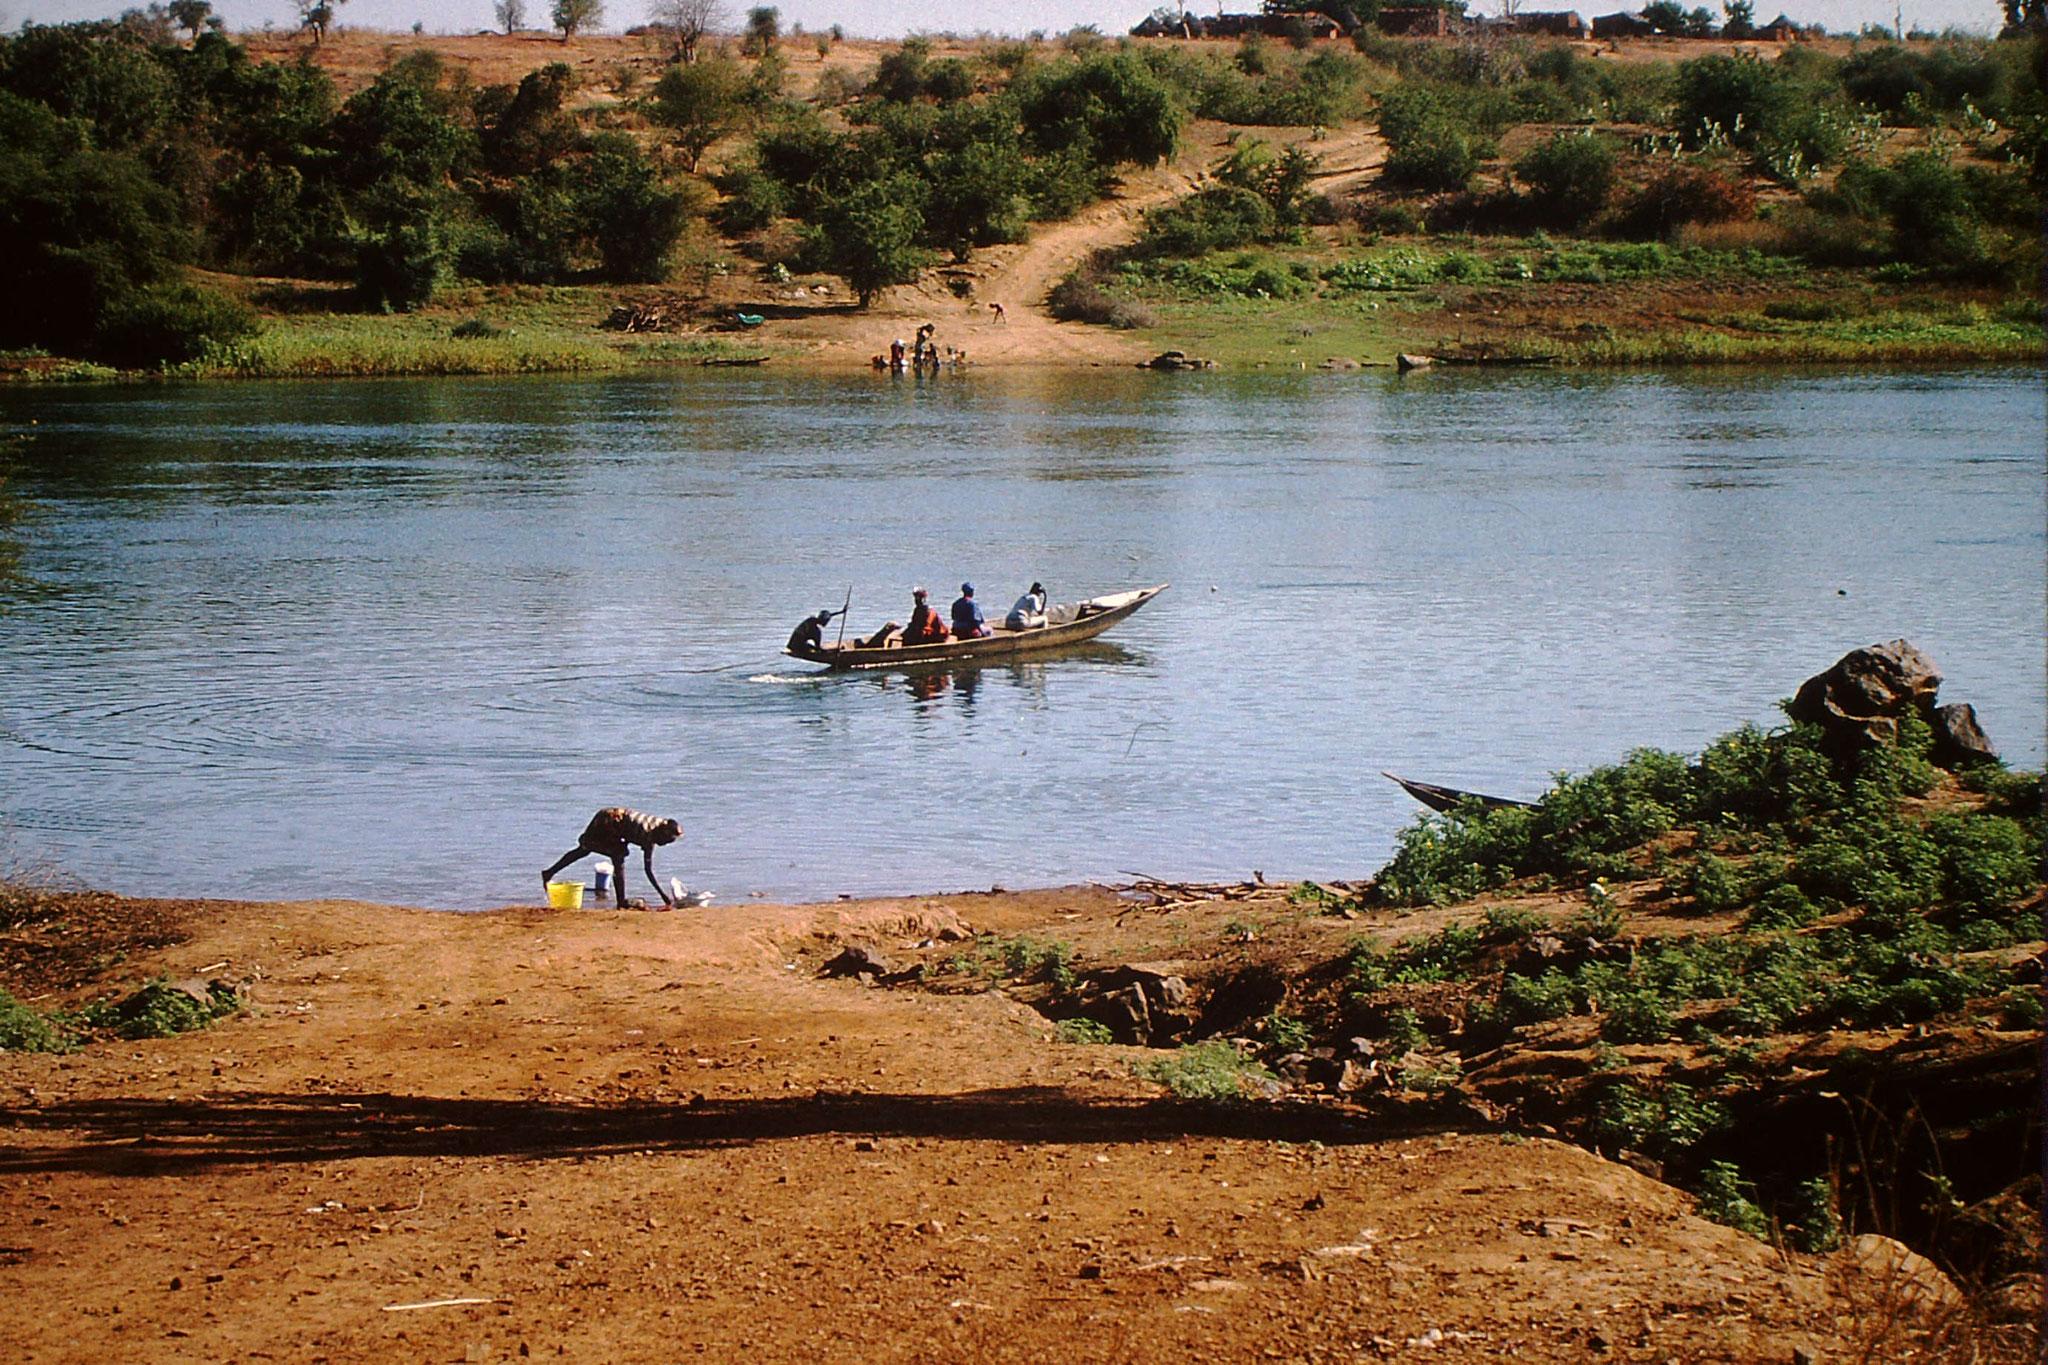 Piroge auf dem Fluss Senegal.